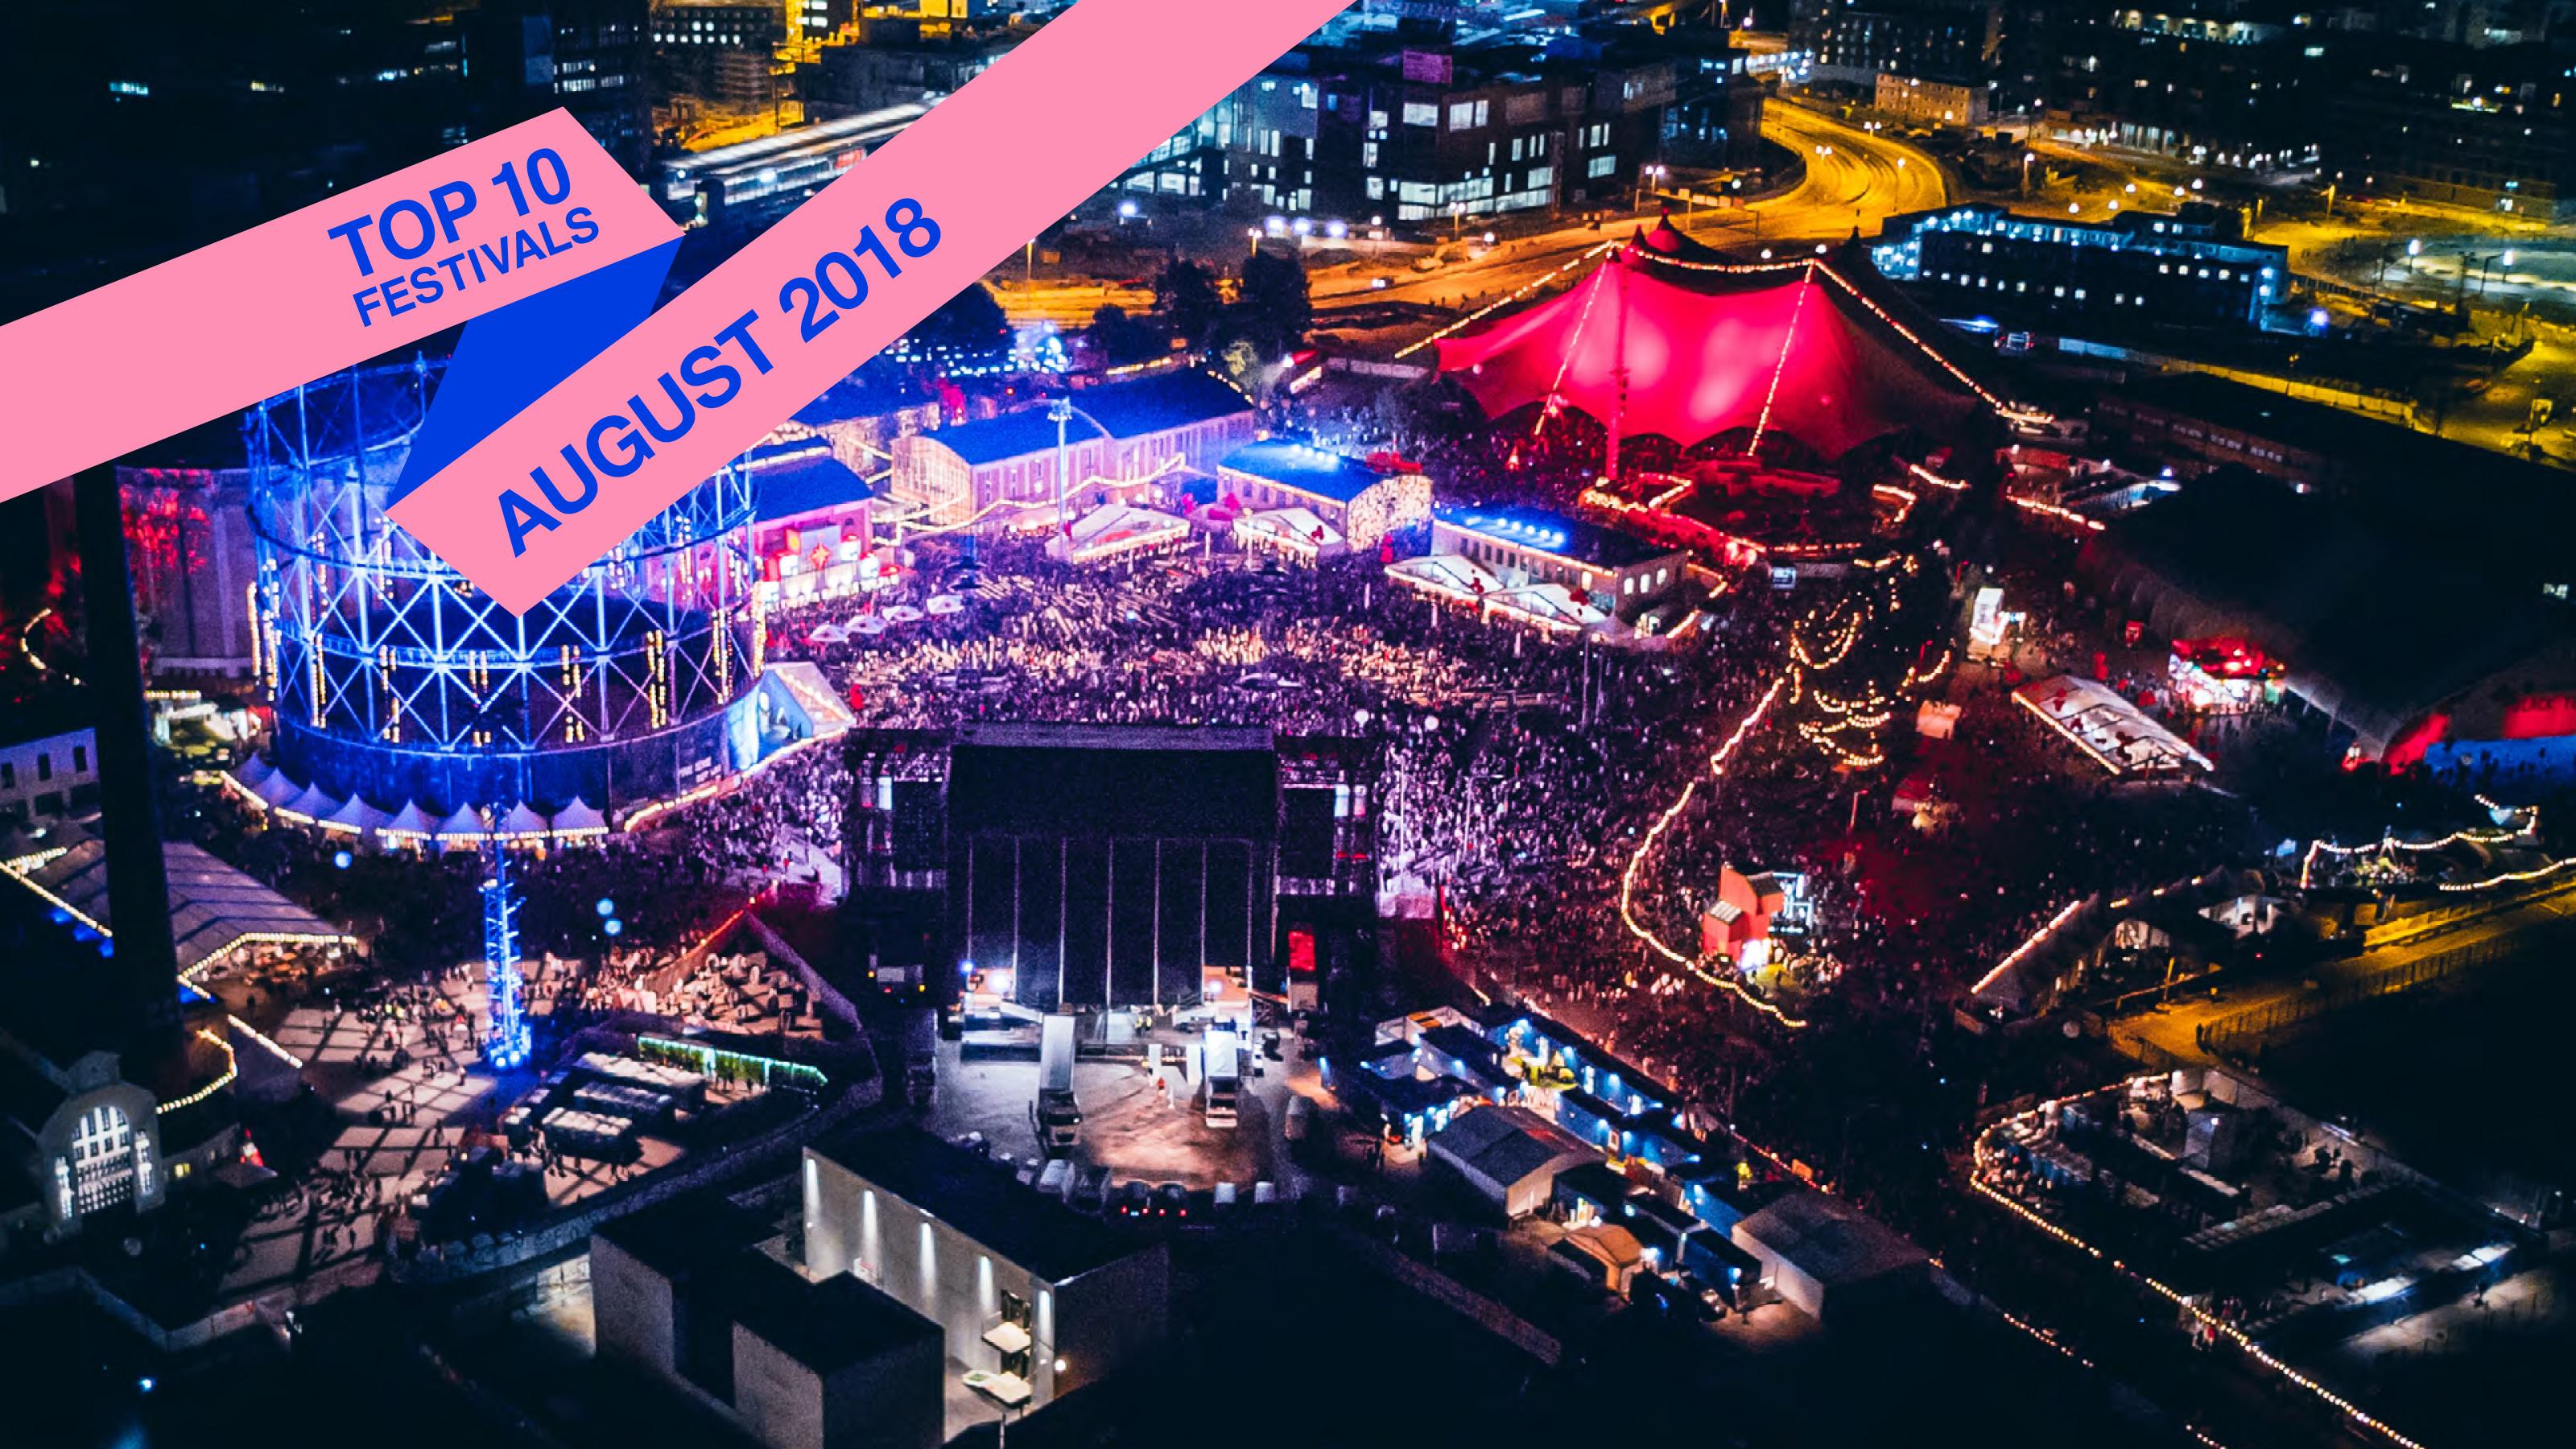 Top 10 August Festivals